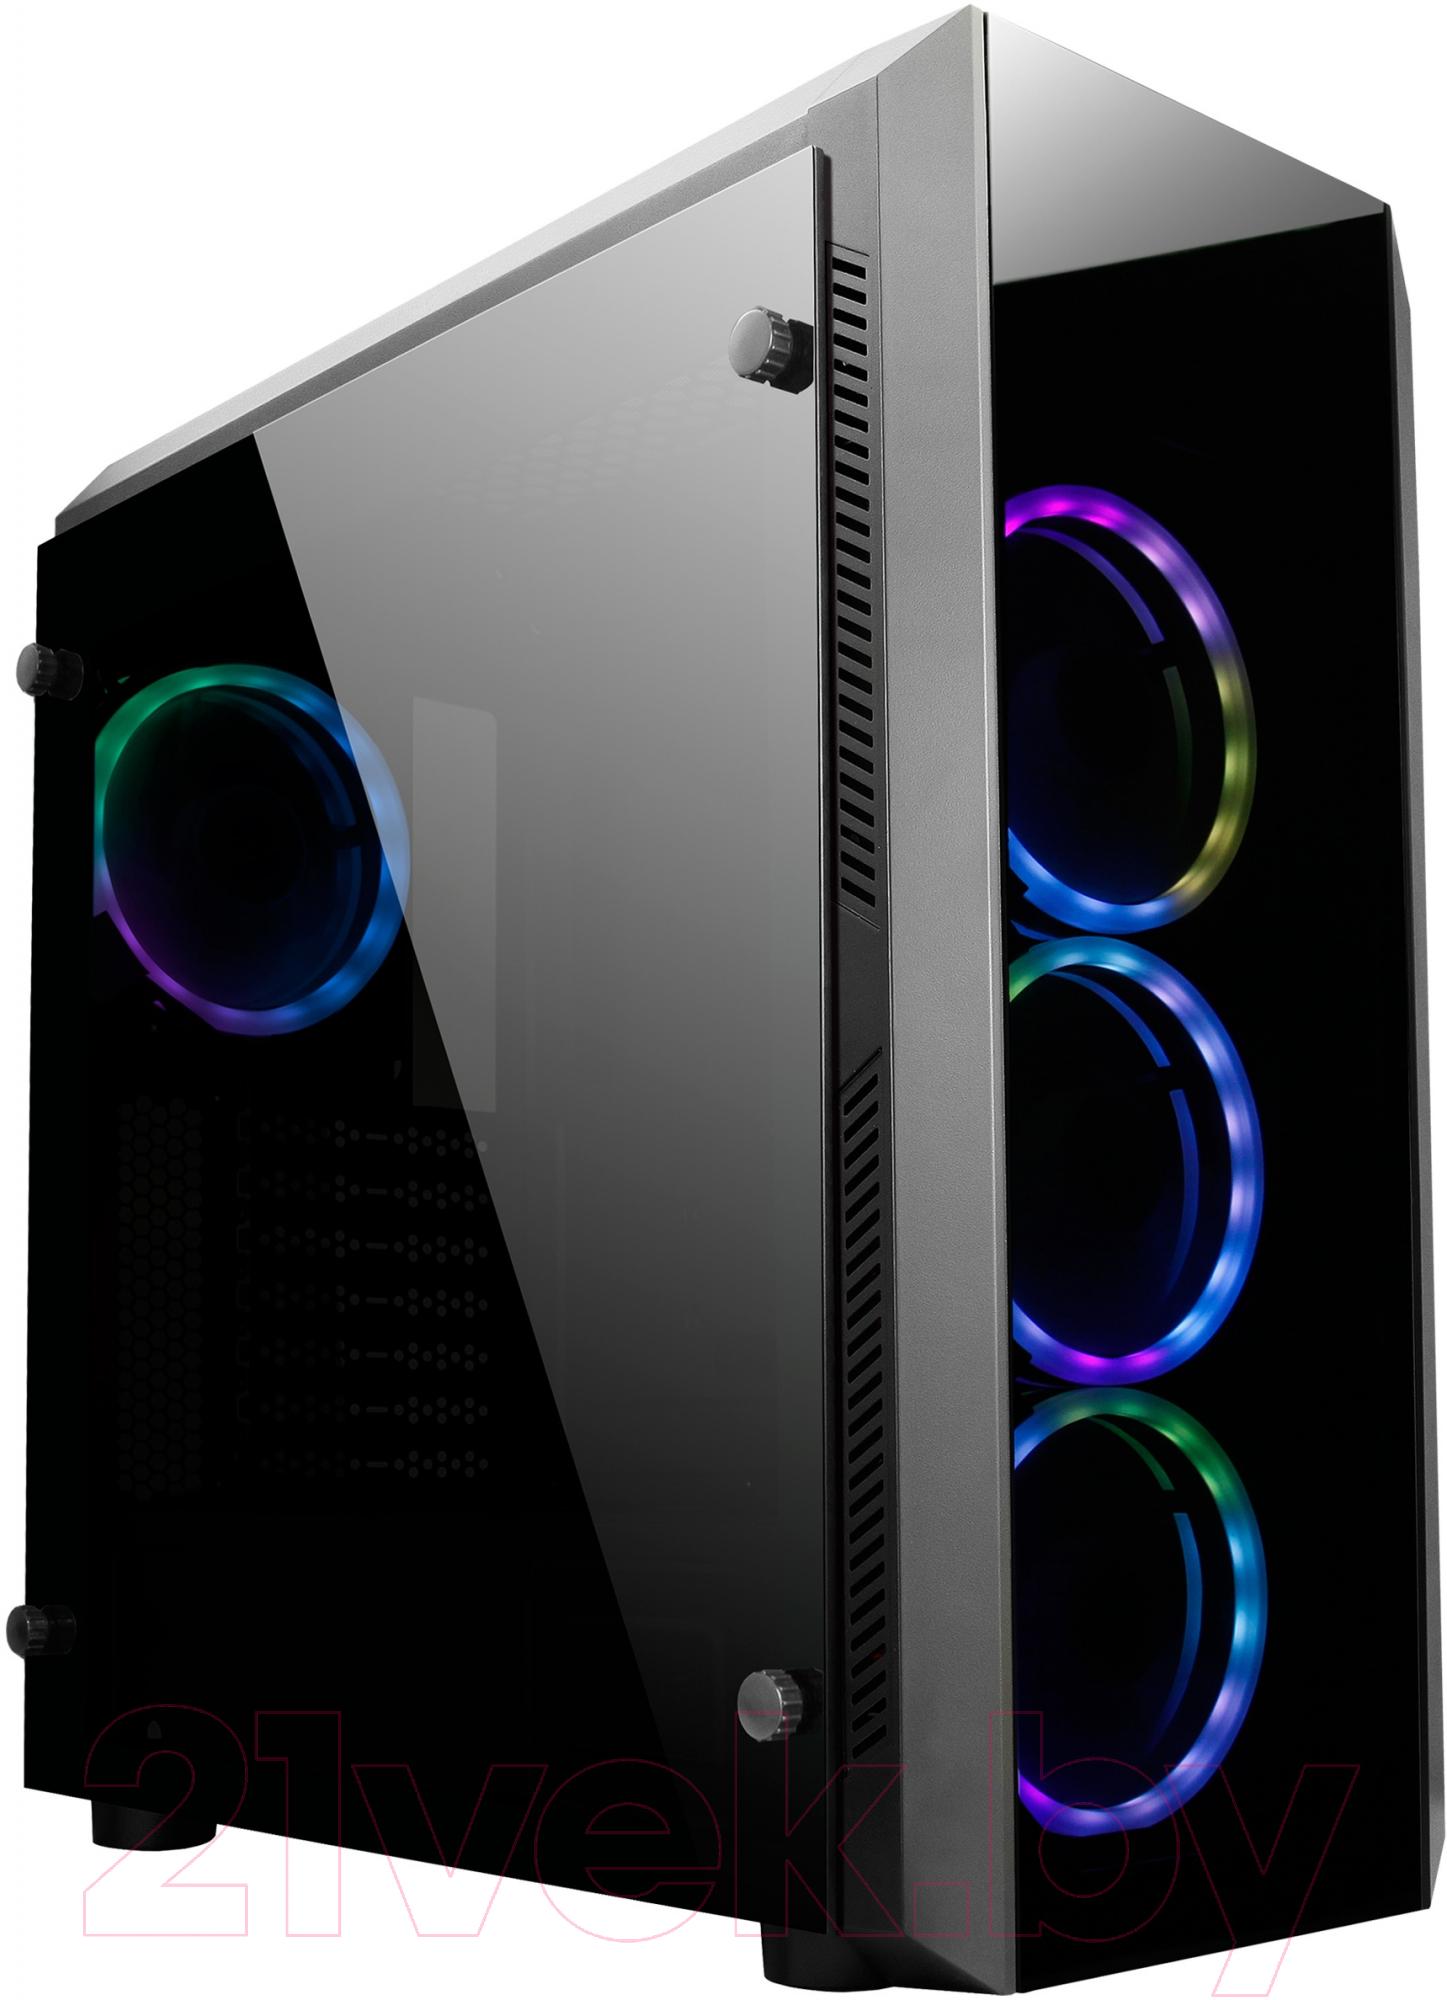 Купить Системный блок Jet, Gamer Grand 9i9900KD32HD2SD48X208C2H7, Беларусь